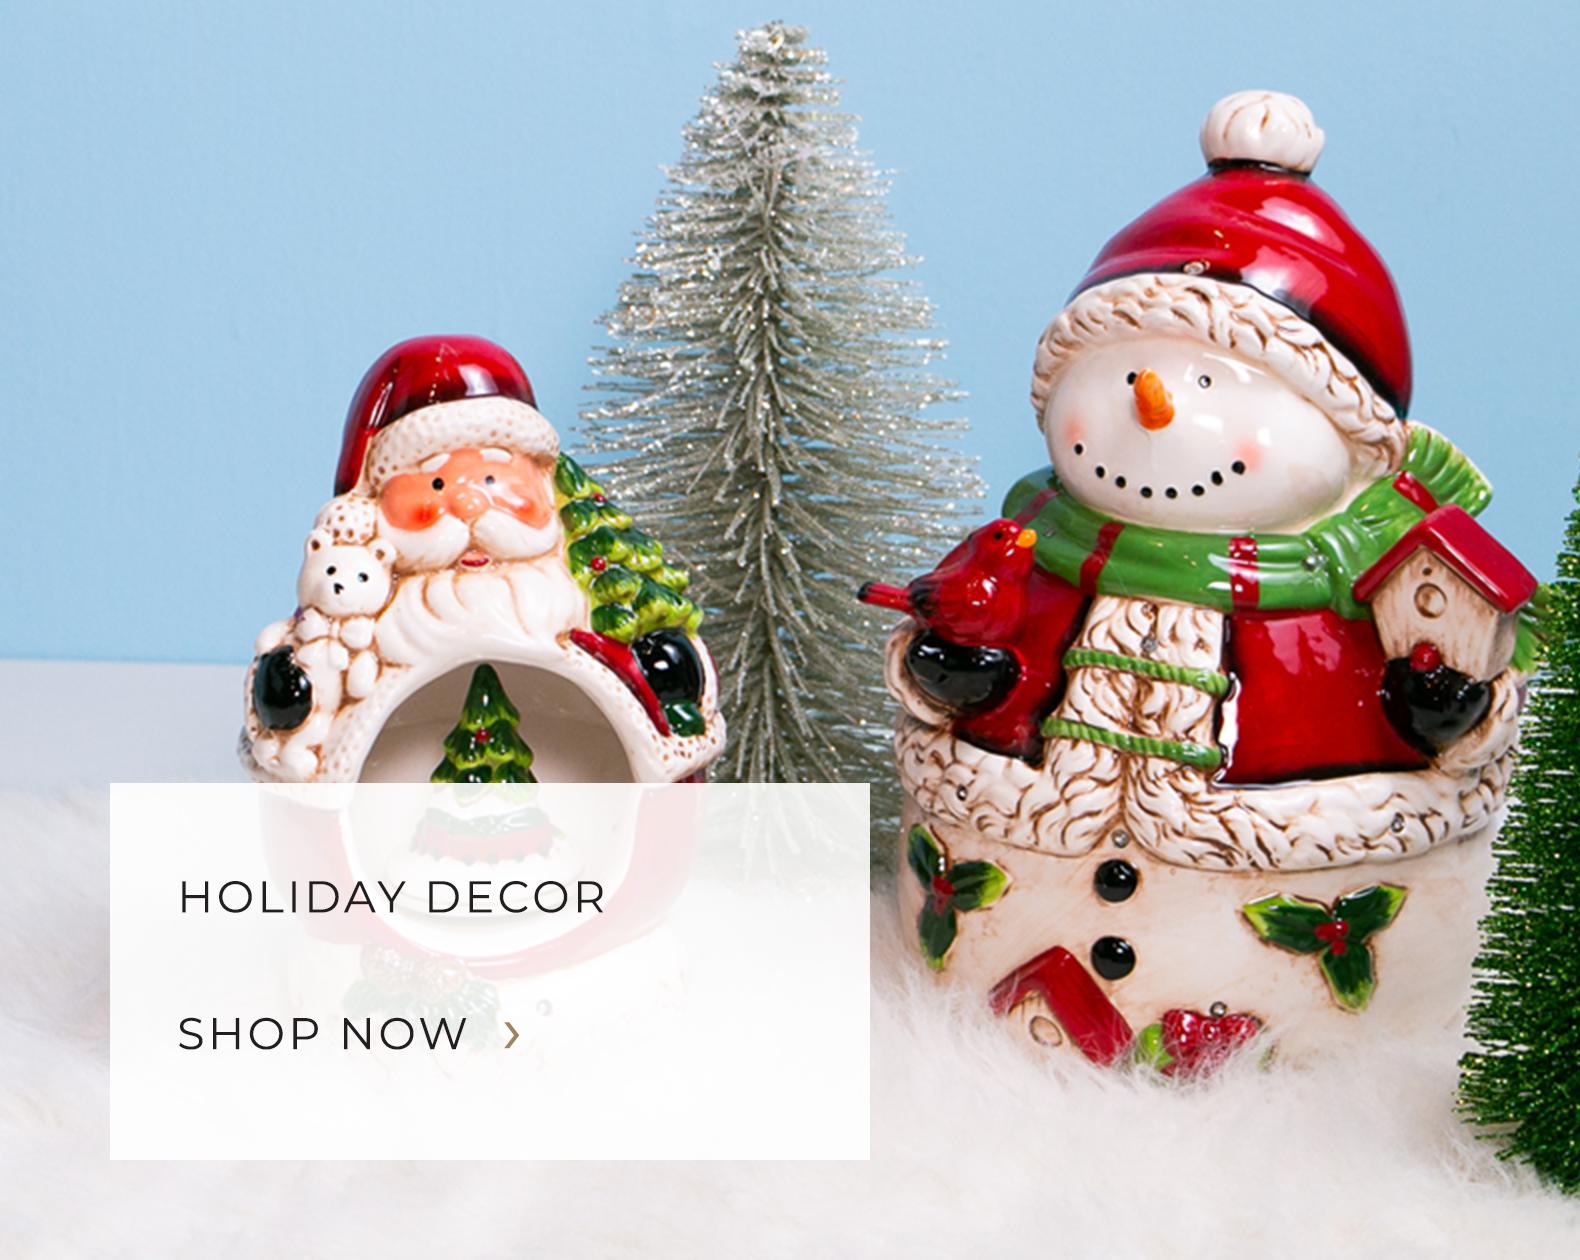 Holiday Decor - Figurines, Wreaths, Wall Decor